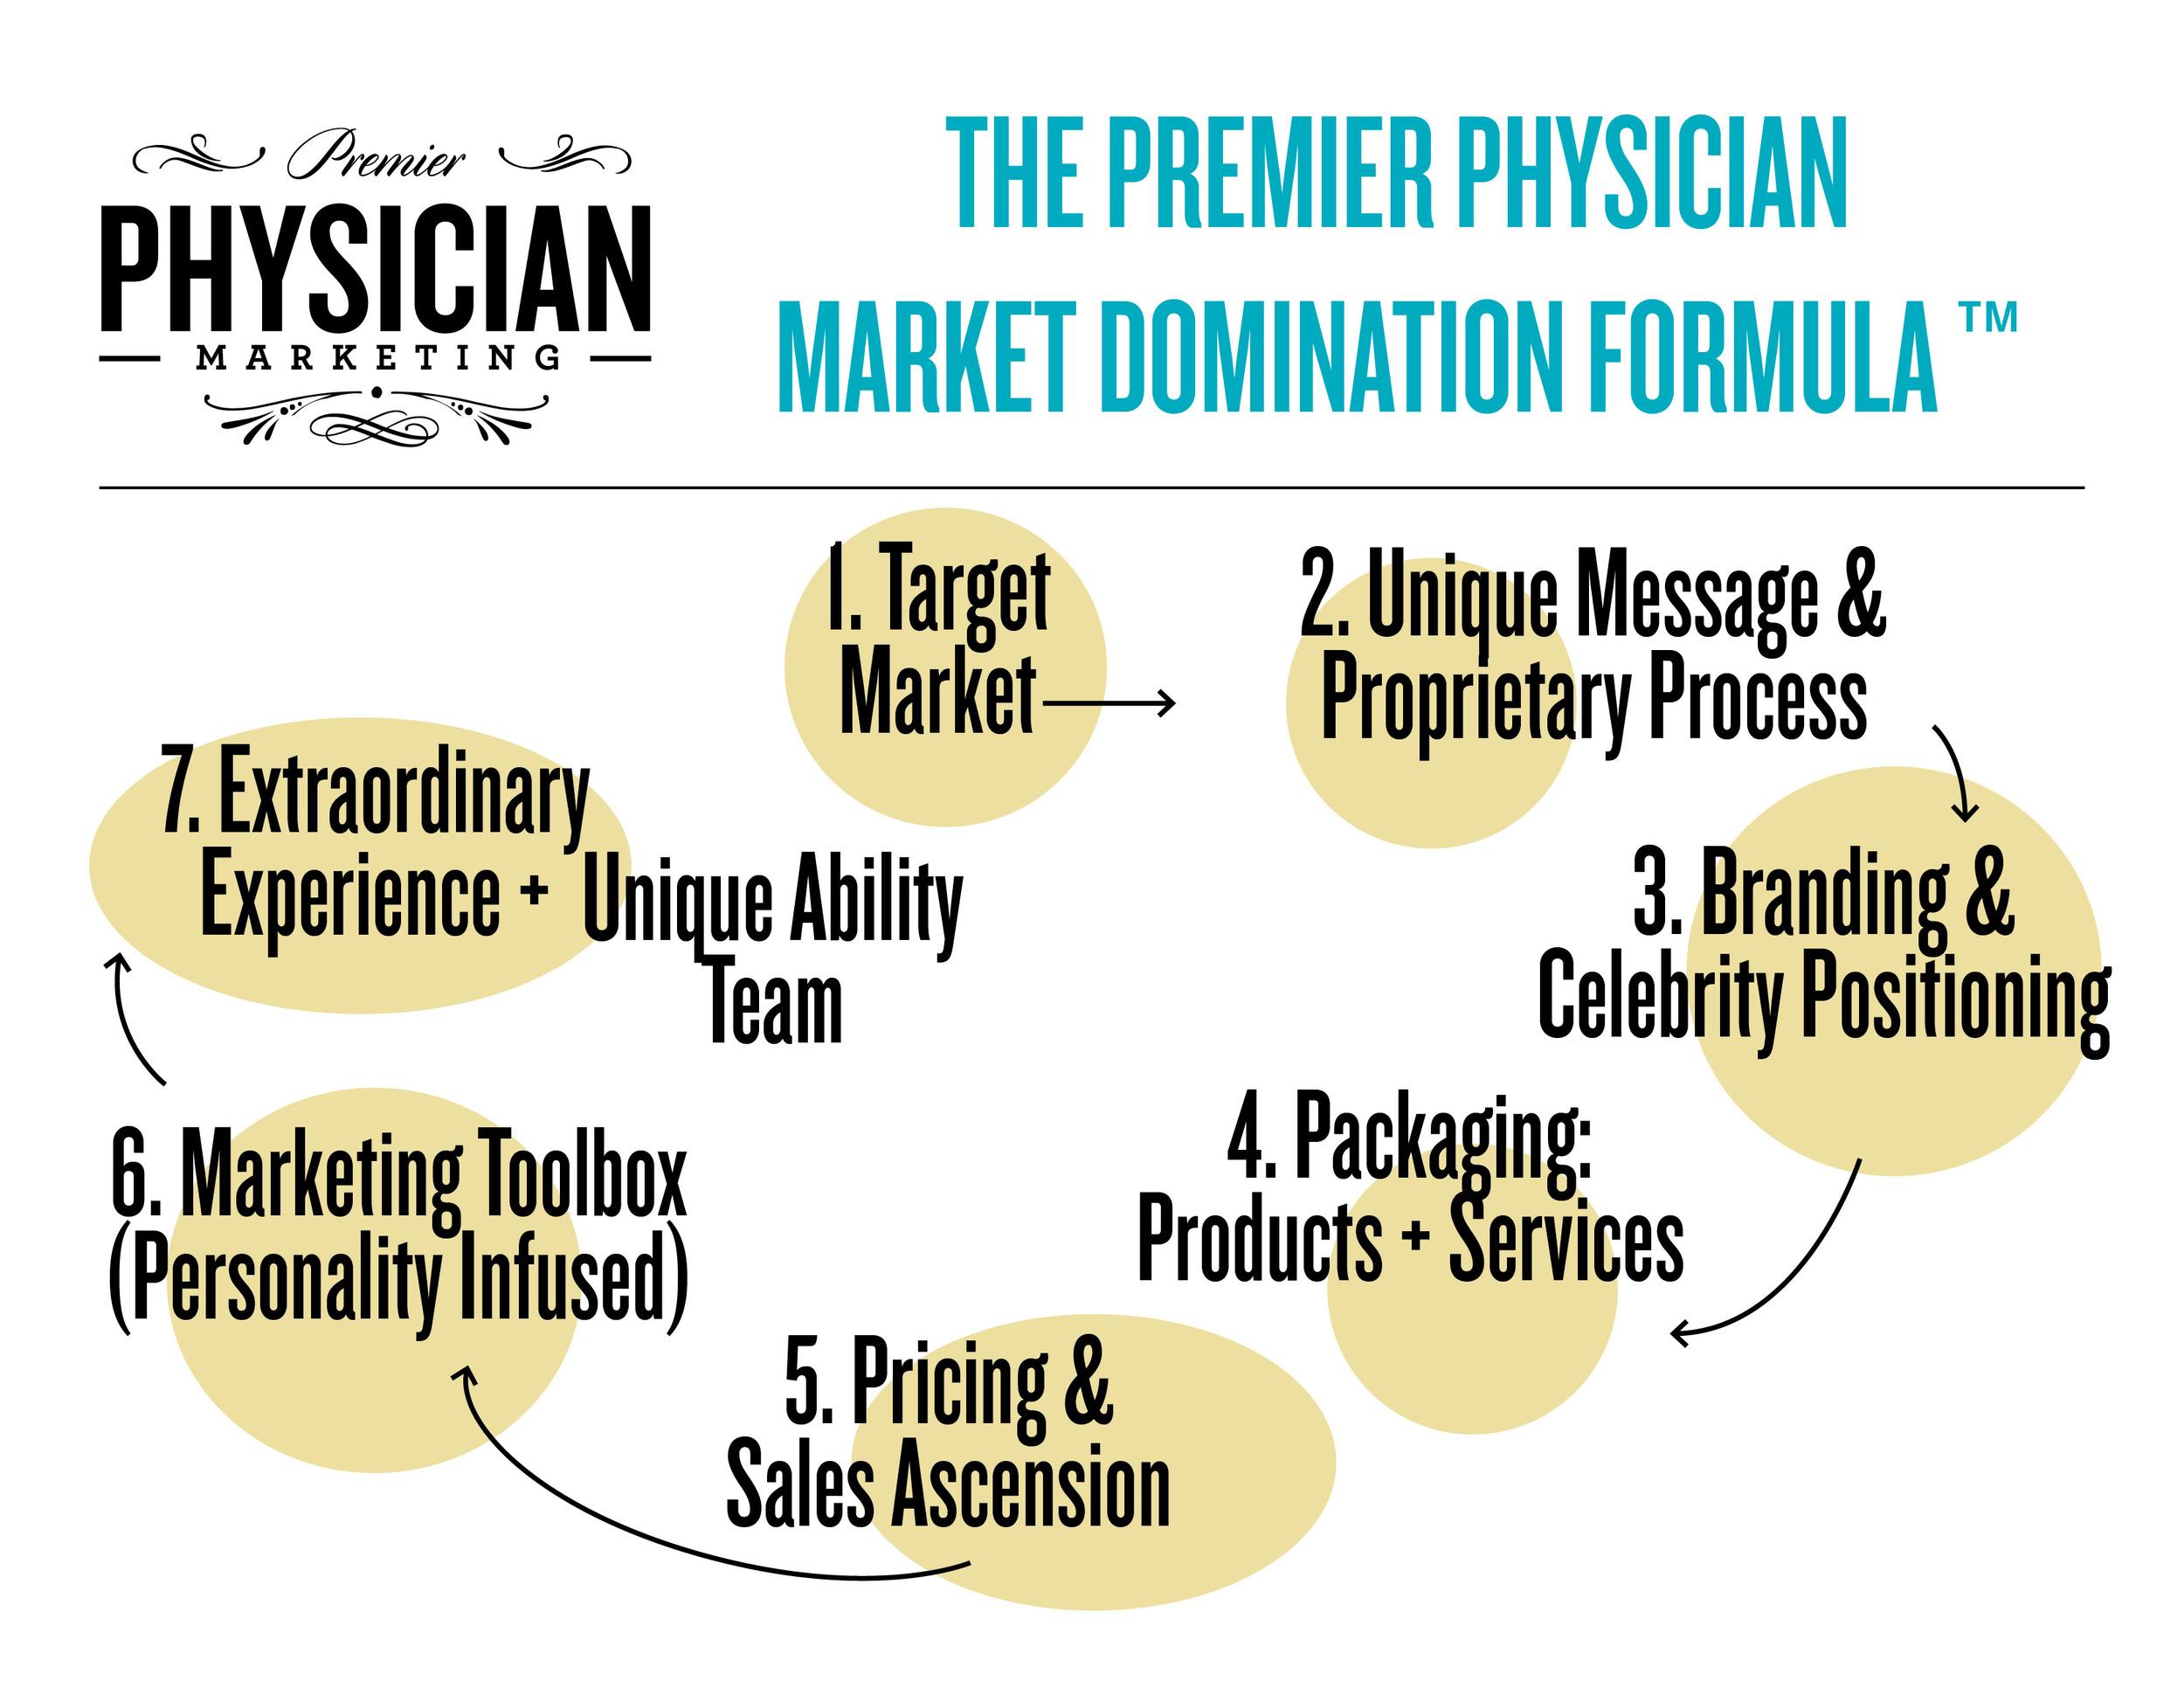 premier-physician-marketing-domination-formula